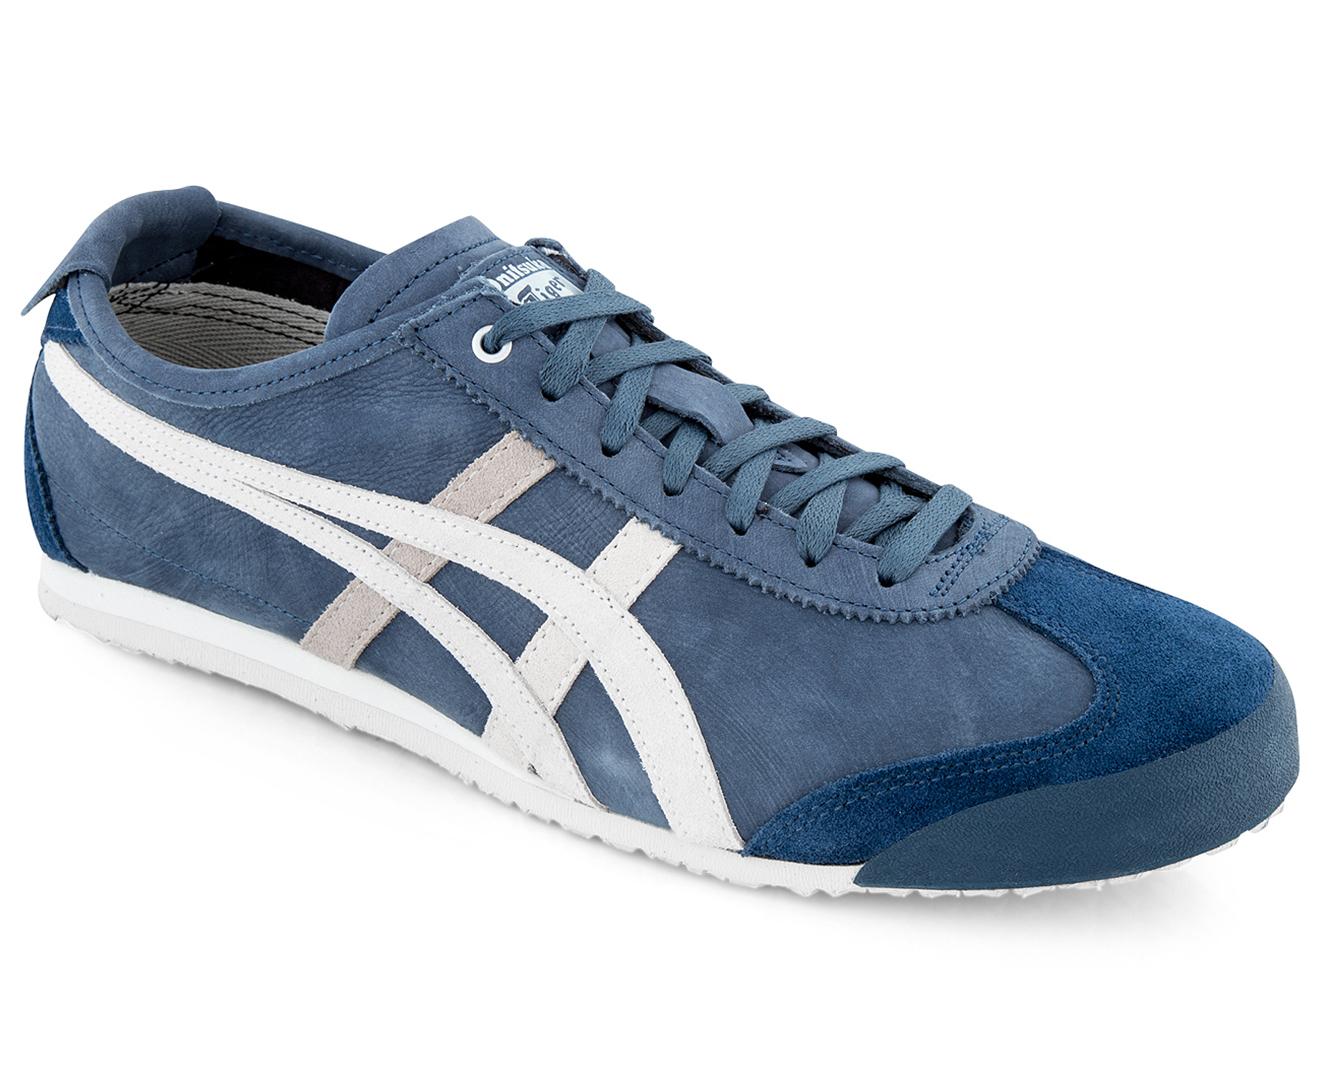 hot sale online 073d7 8e295 Onitsuka Mexico 66 Shoe - Dark Blue/Vaporous Grey